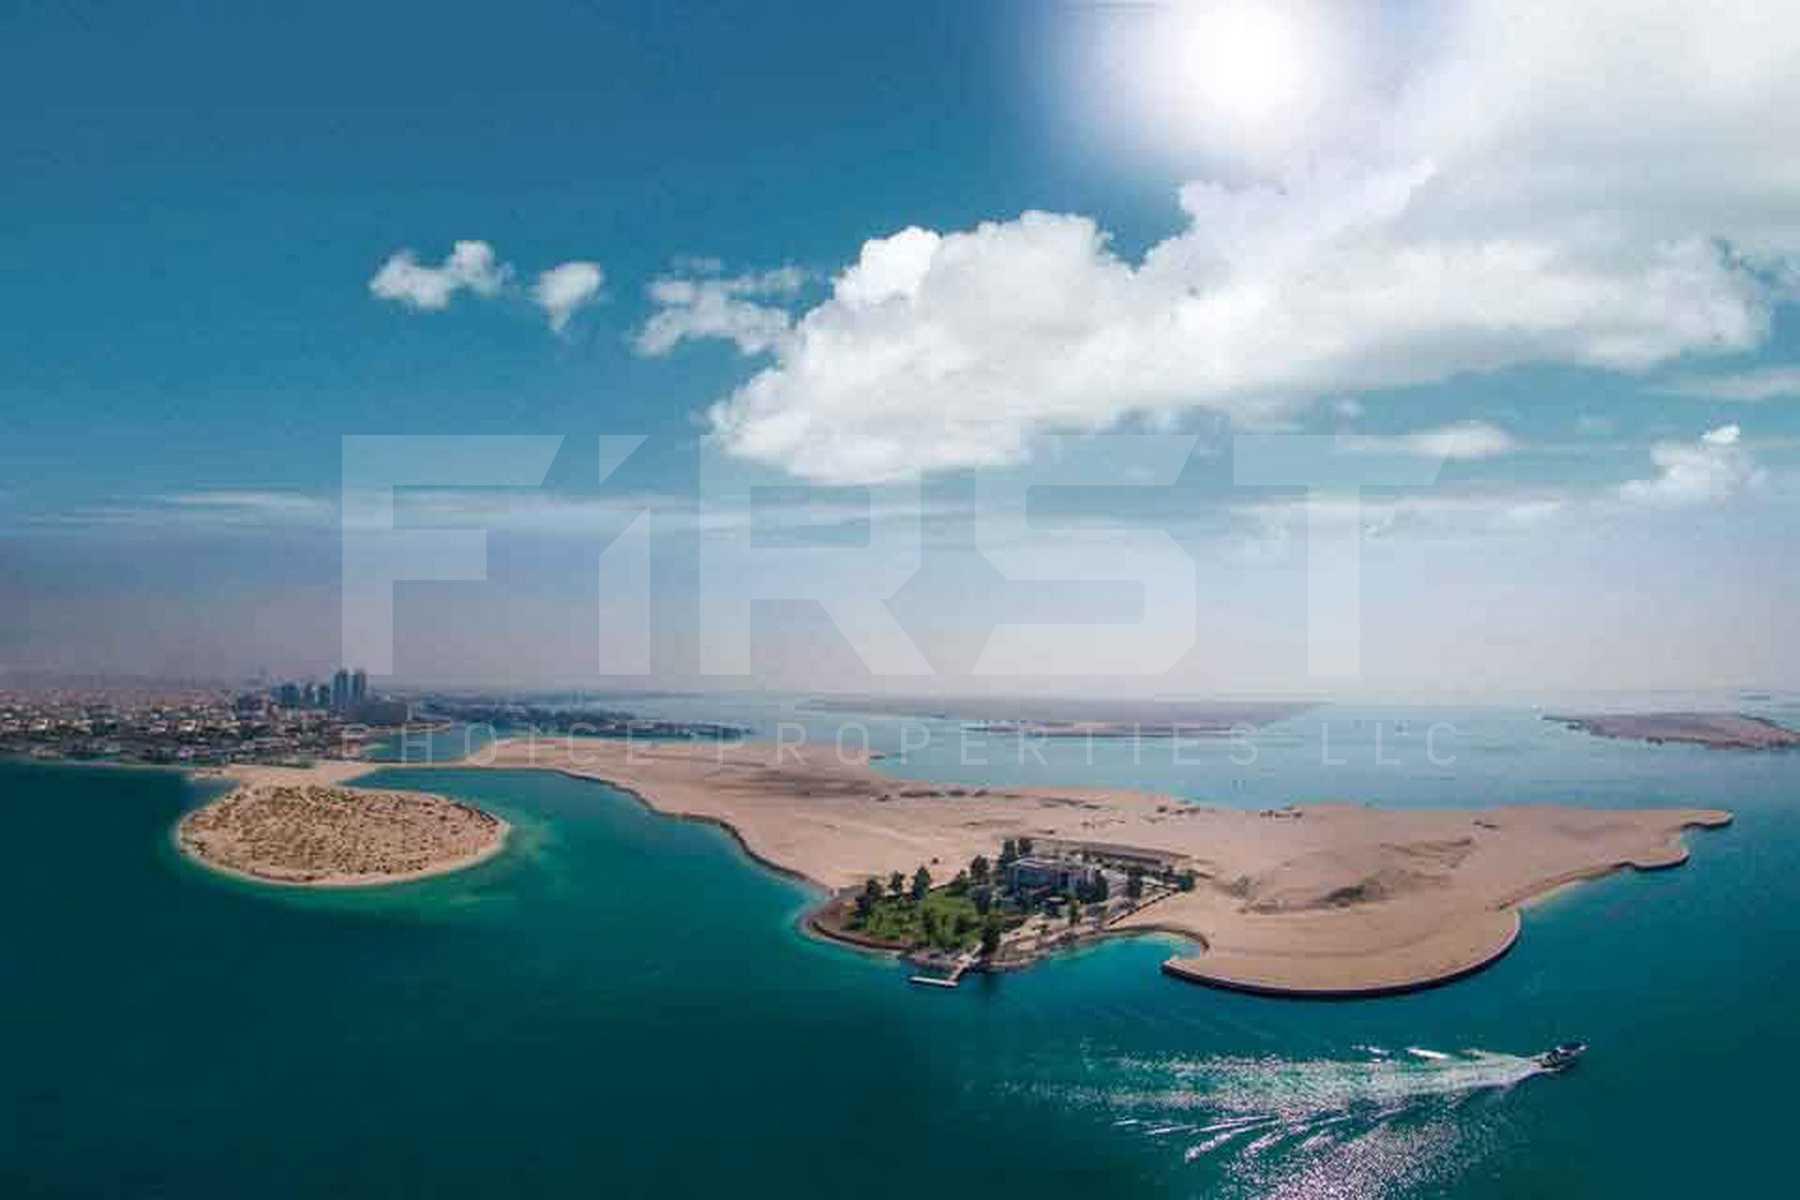 External Photos of NAreel Island Abu Dhabi UAE (4).jpg